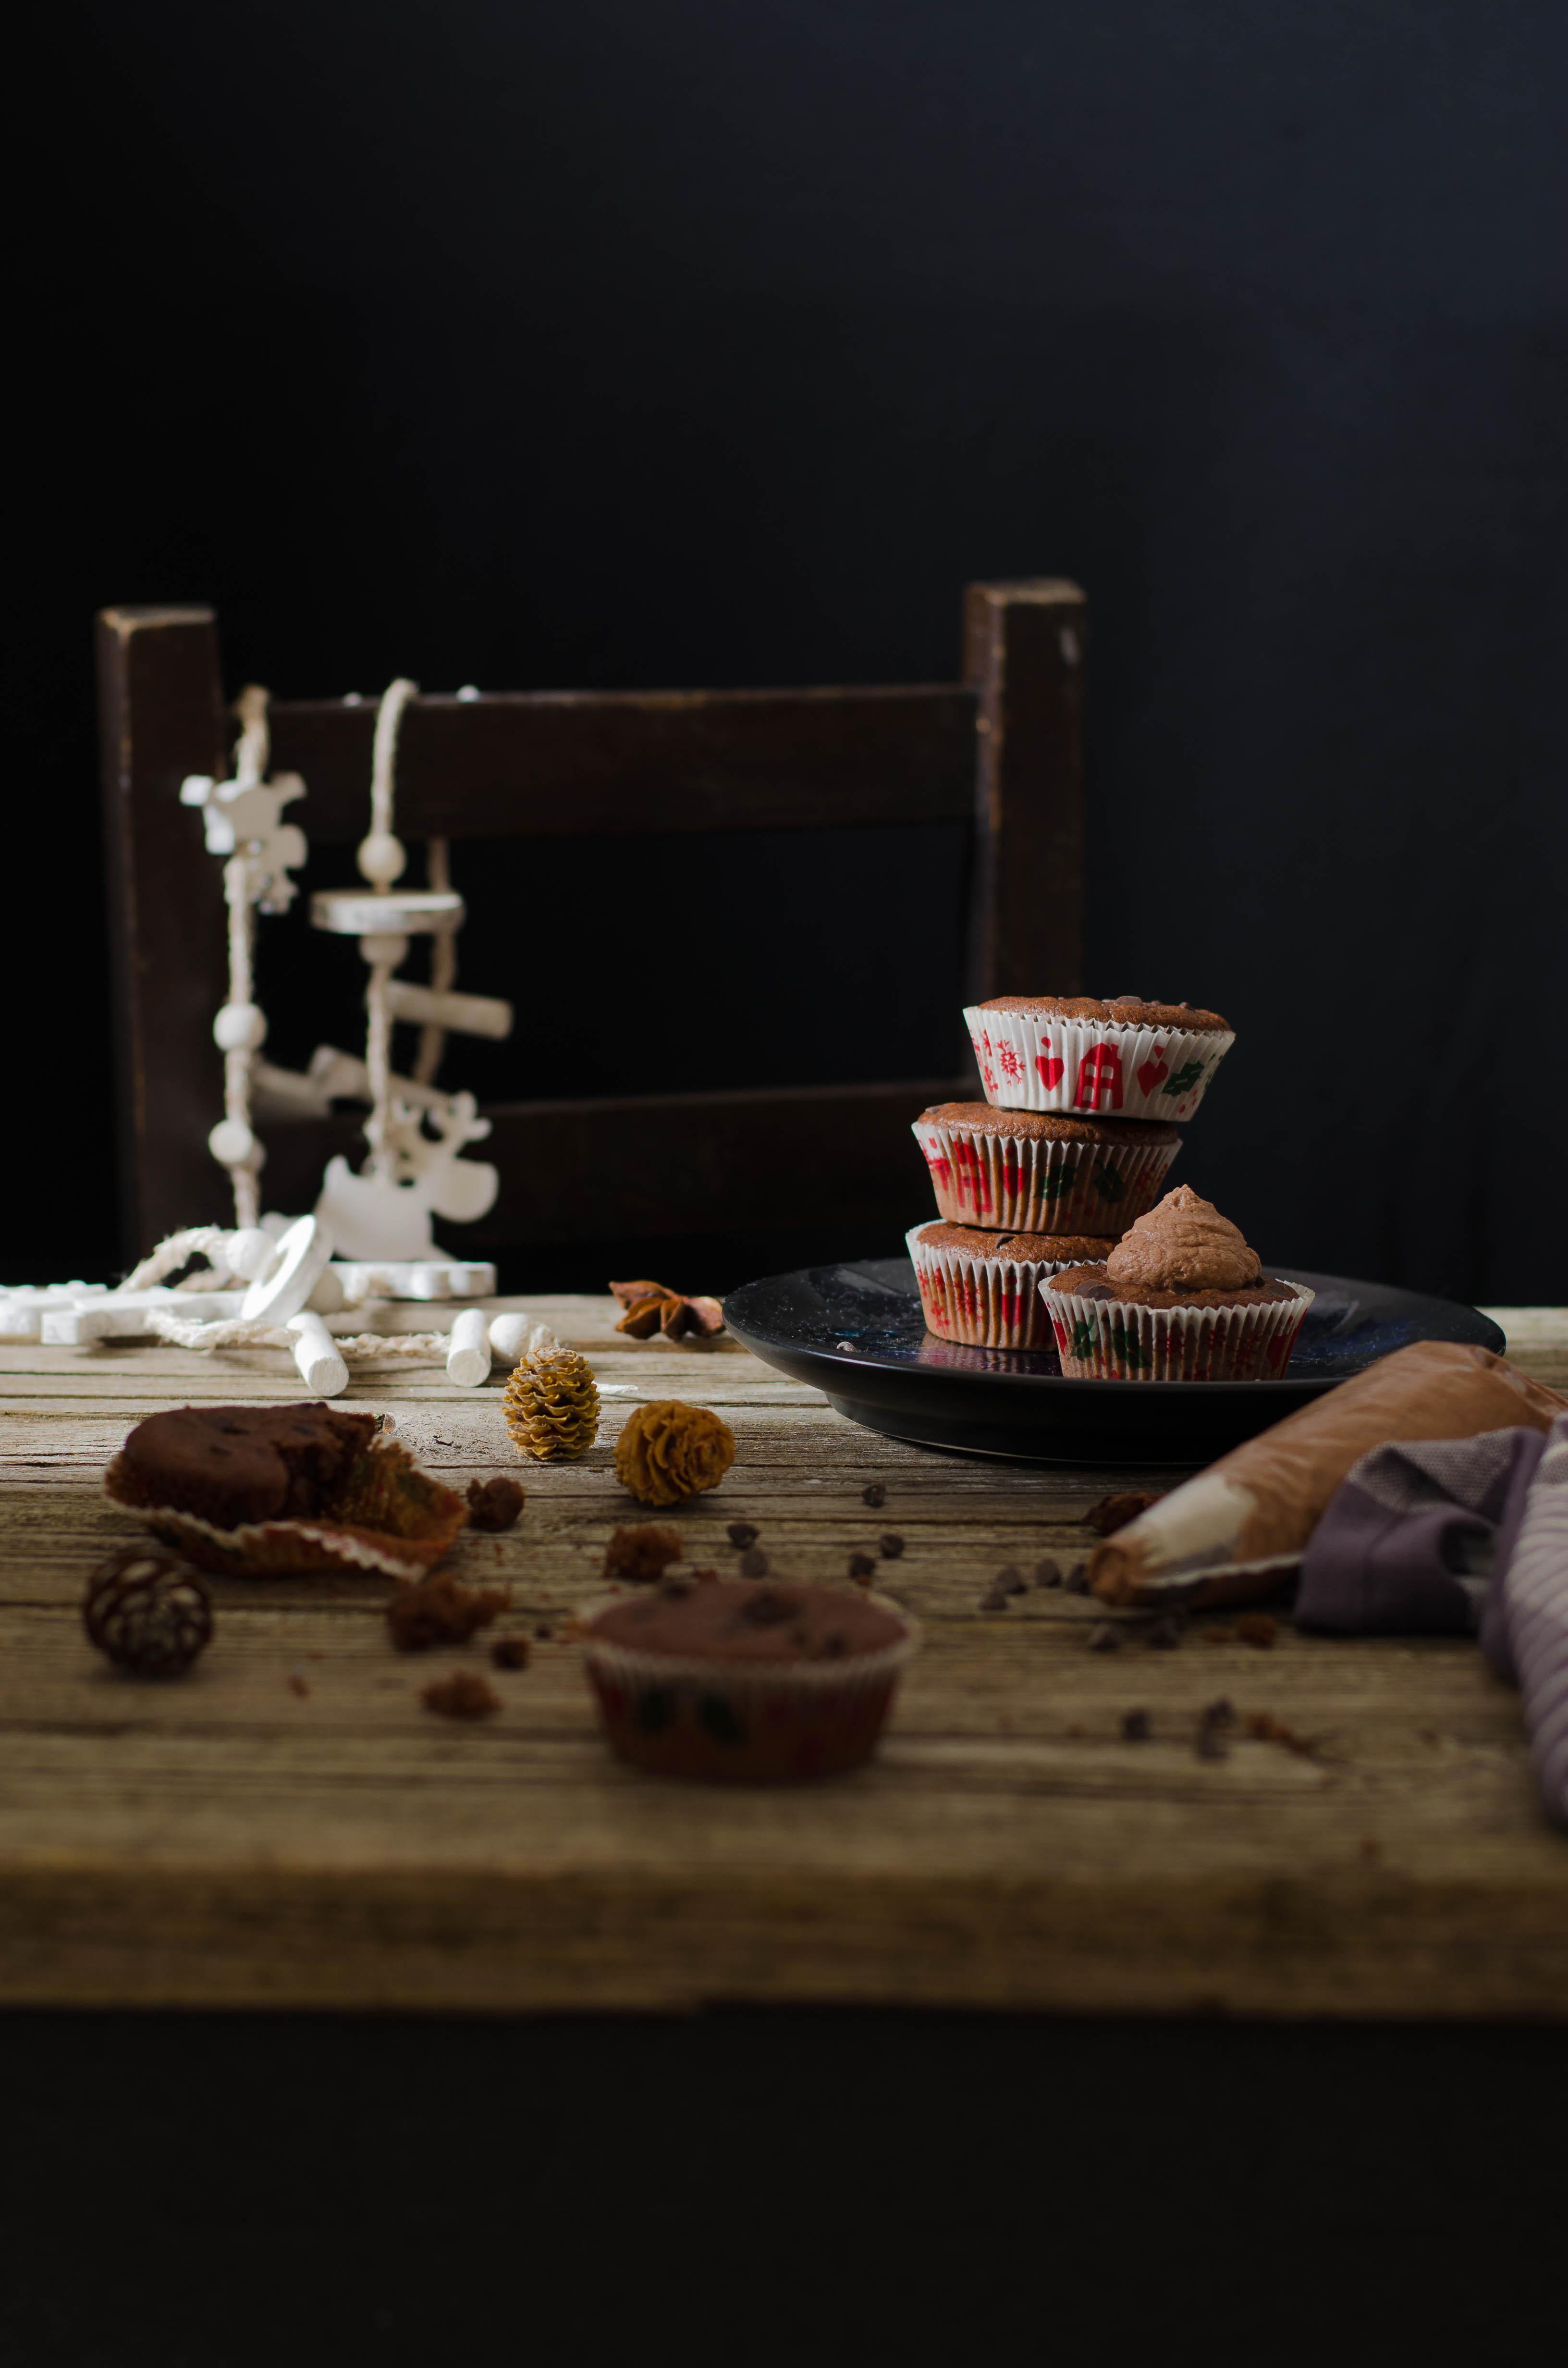 cupcake_cacao_meringa1 Cupcakes al doppio cioccolato, crema meringa, mascarpone e cacao